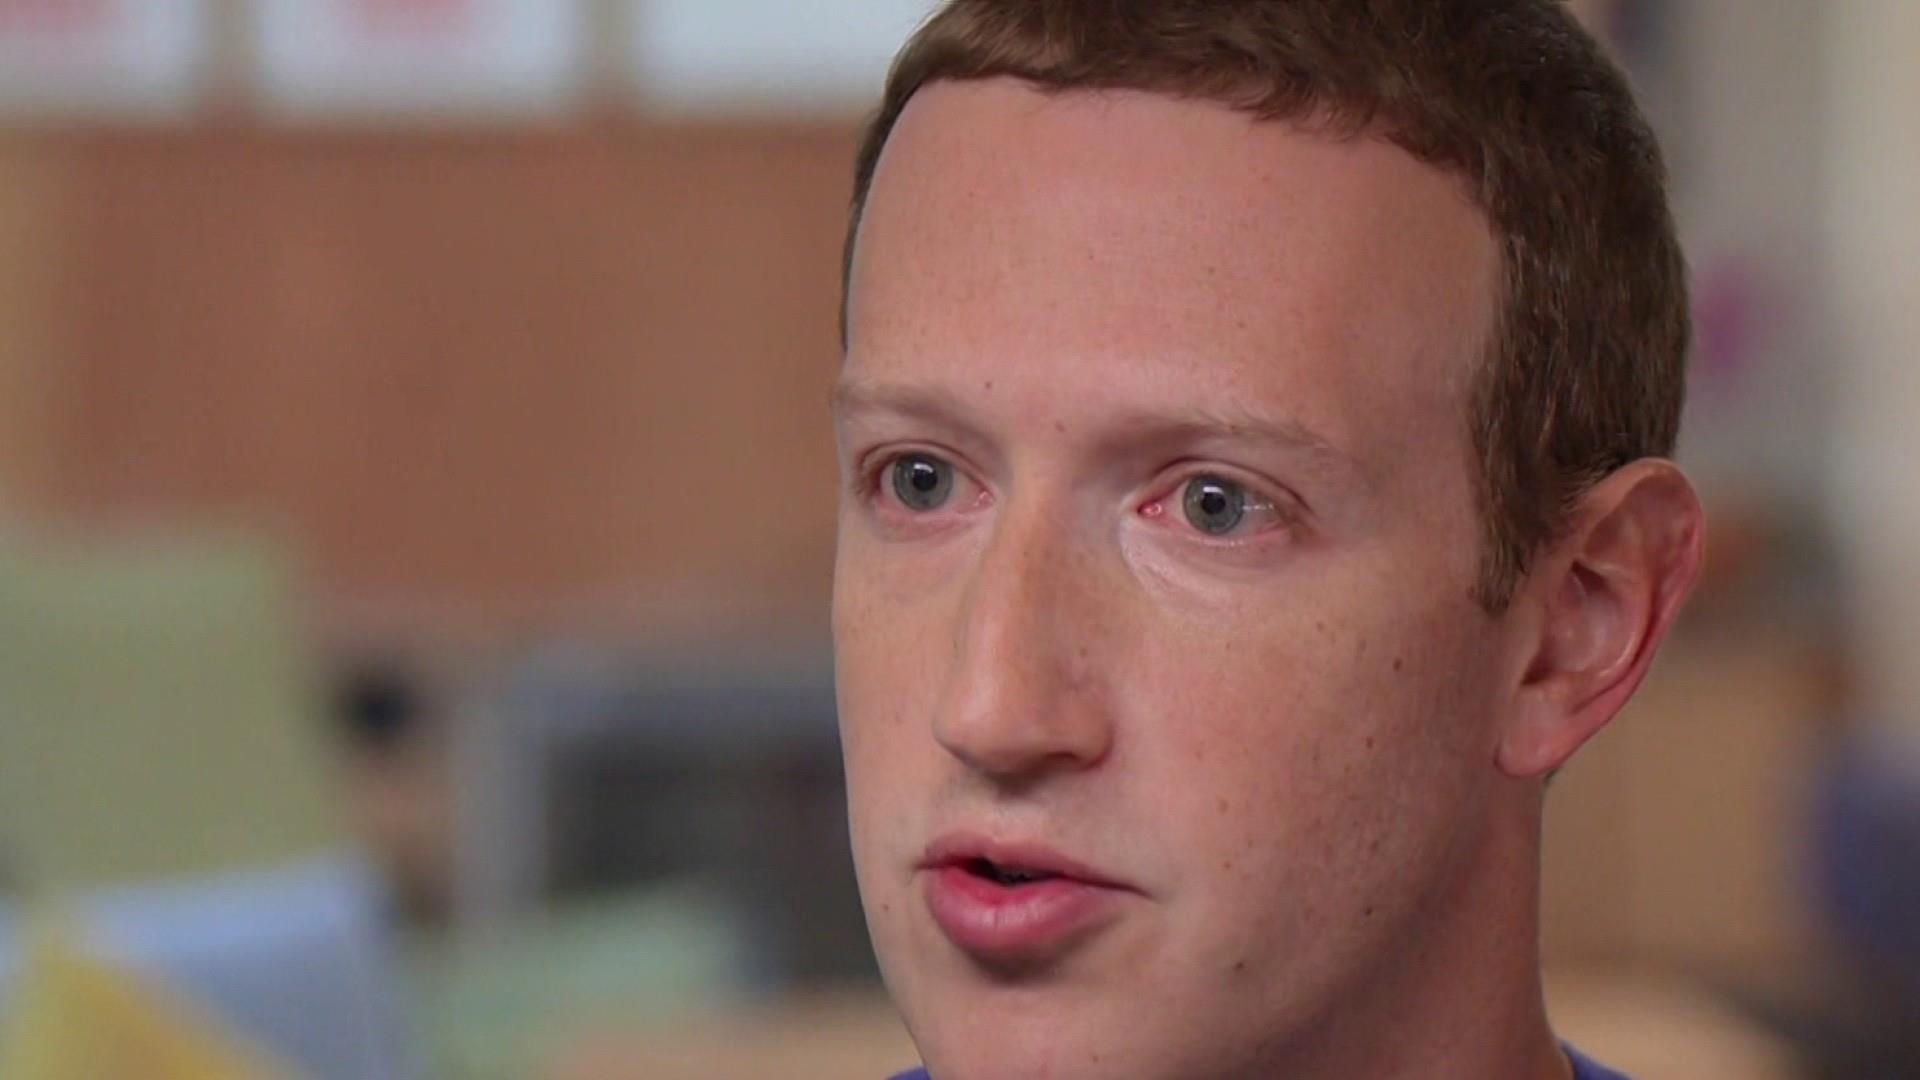 Zuckerberg believes politicians should be uncensored on Facebook